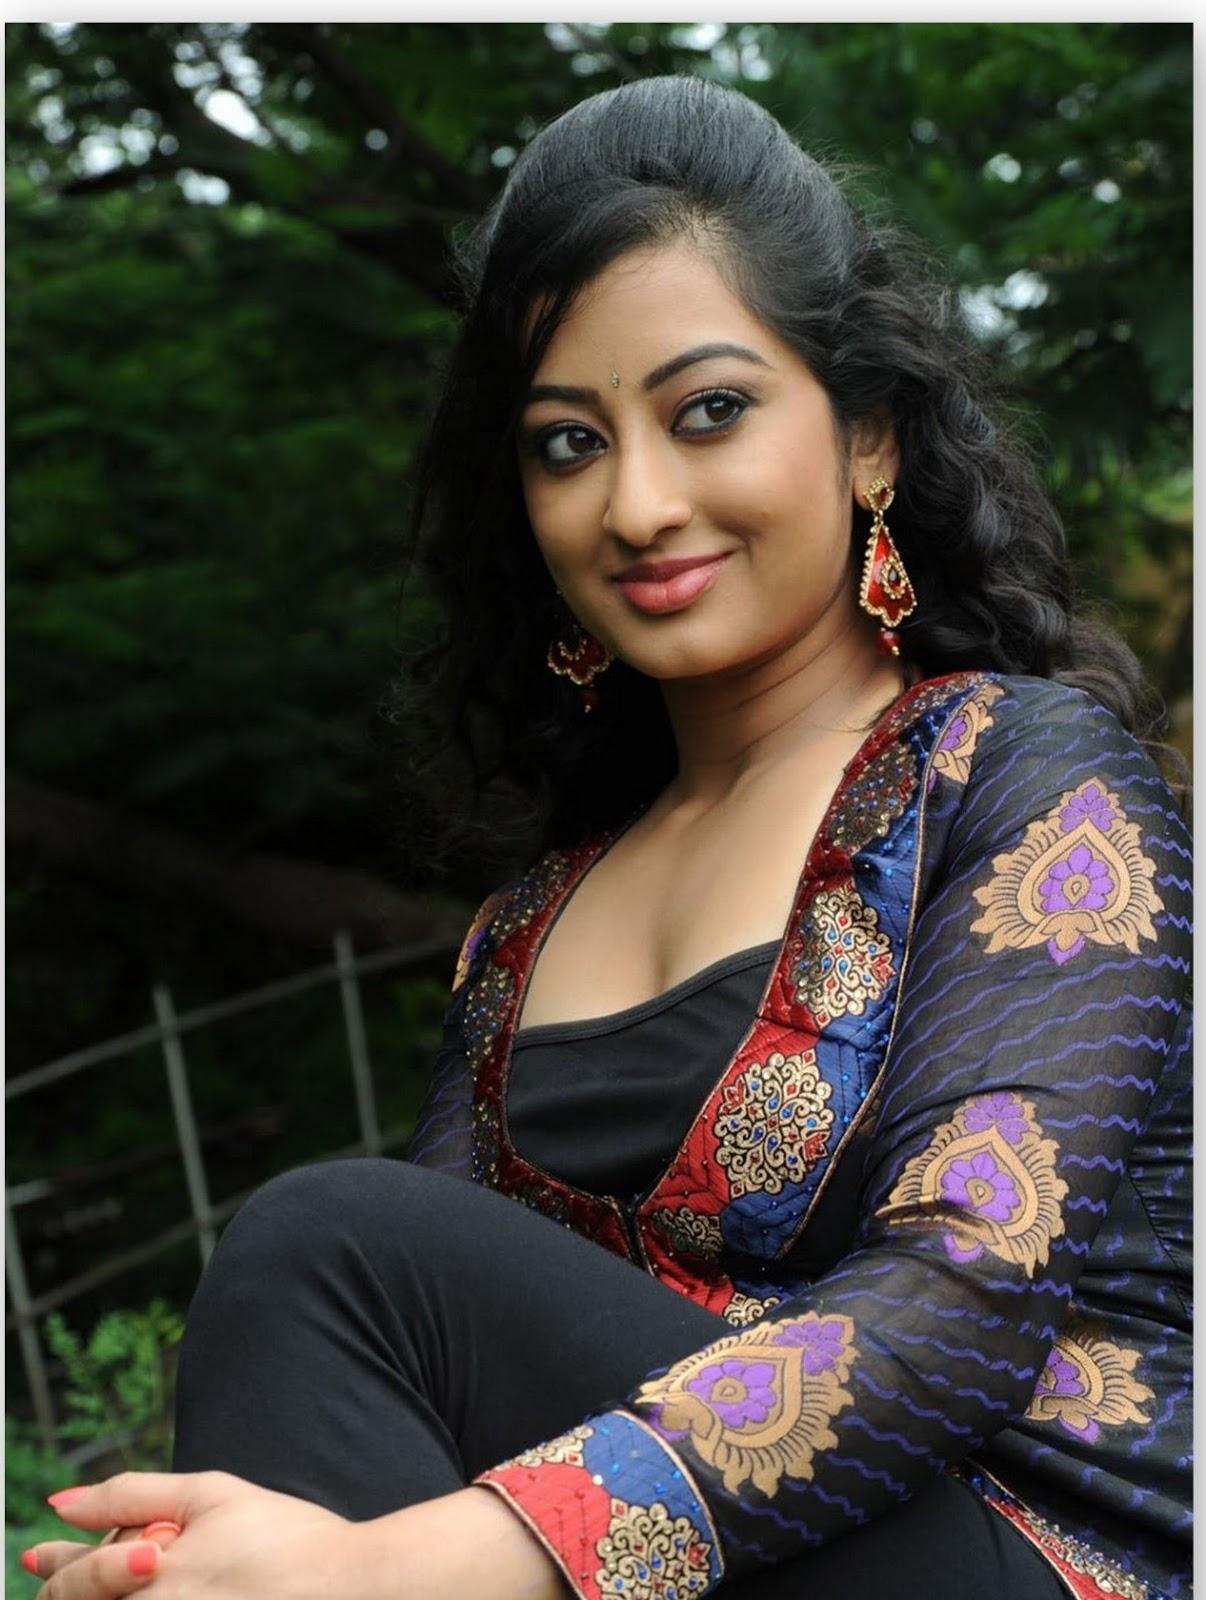 Looking Bhabhi gand hindi in sex story hard right